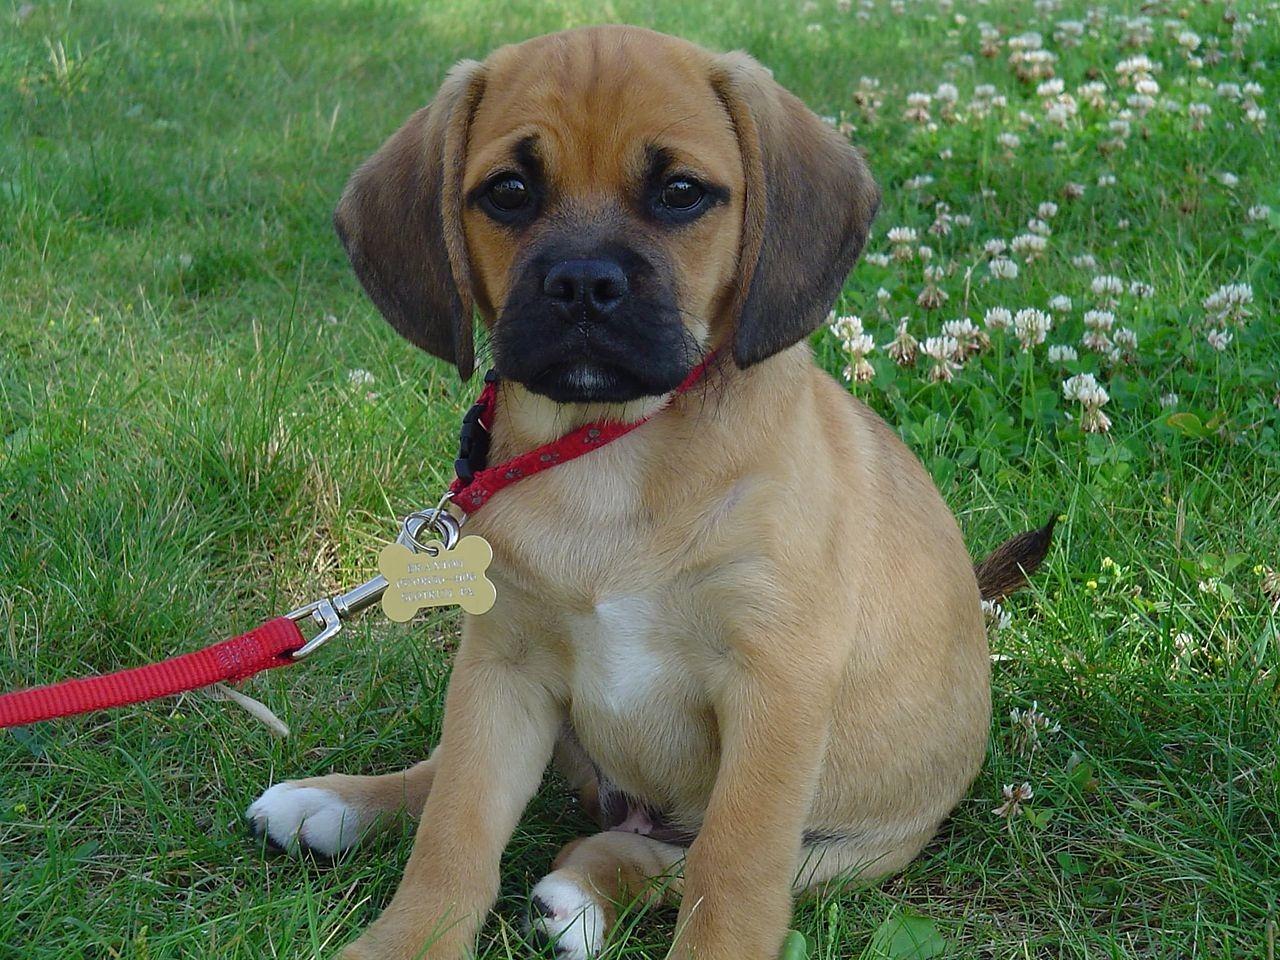 A Pug mixed with a Beagle